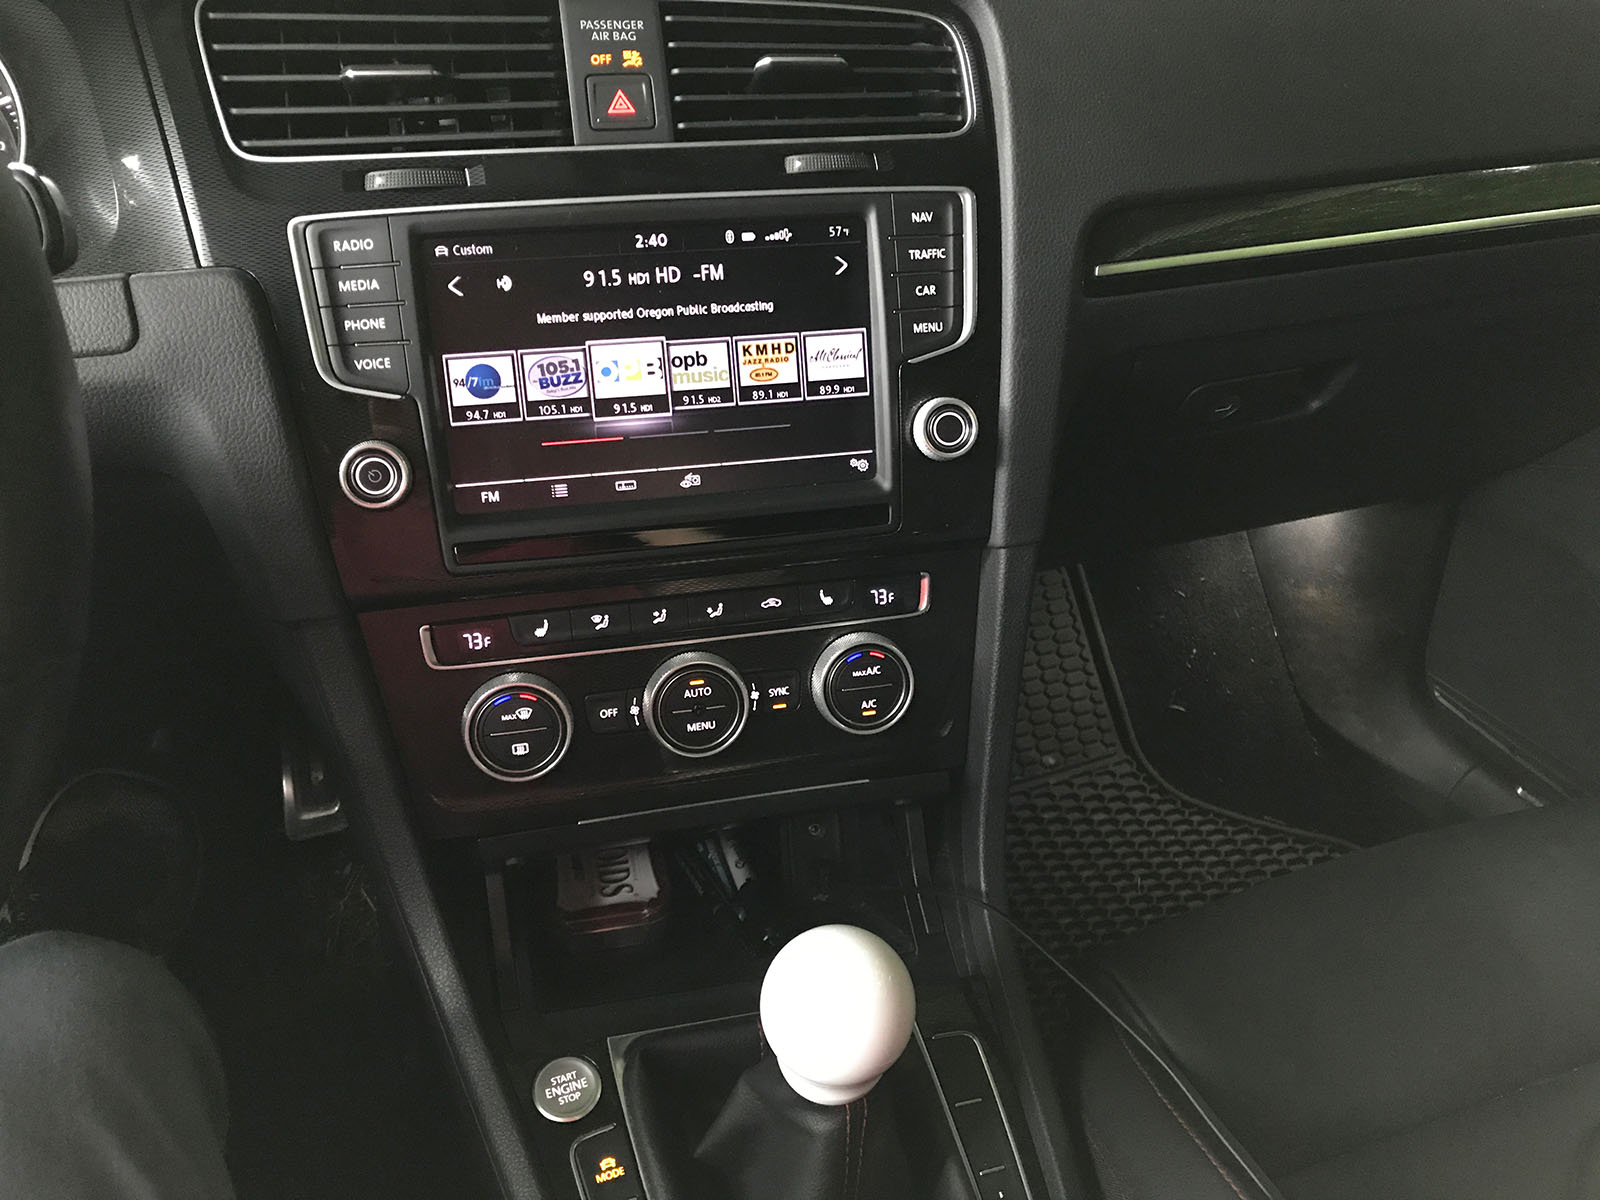 2015 GTI MIB 1 -> MIB 2 Retrofit and VW Central Review